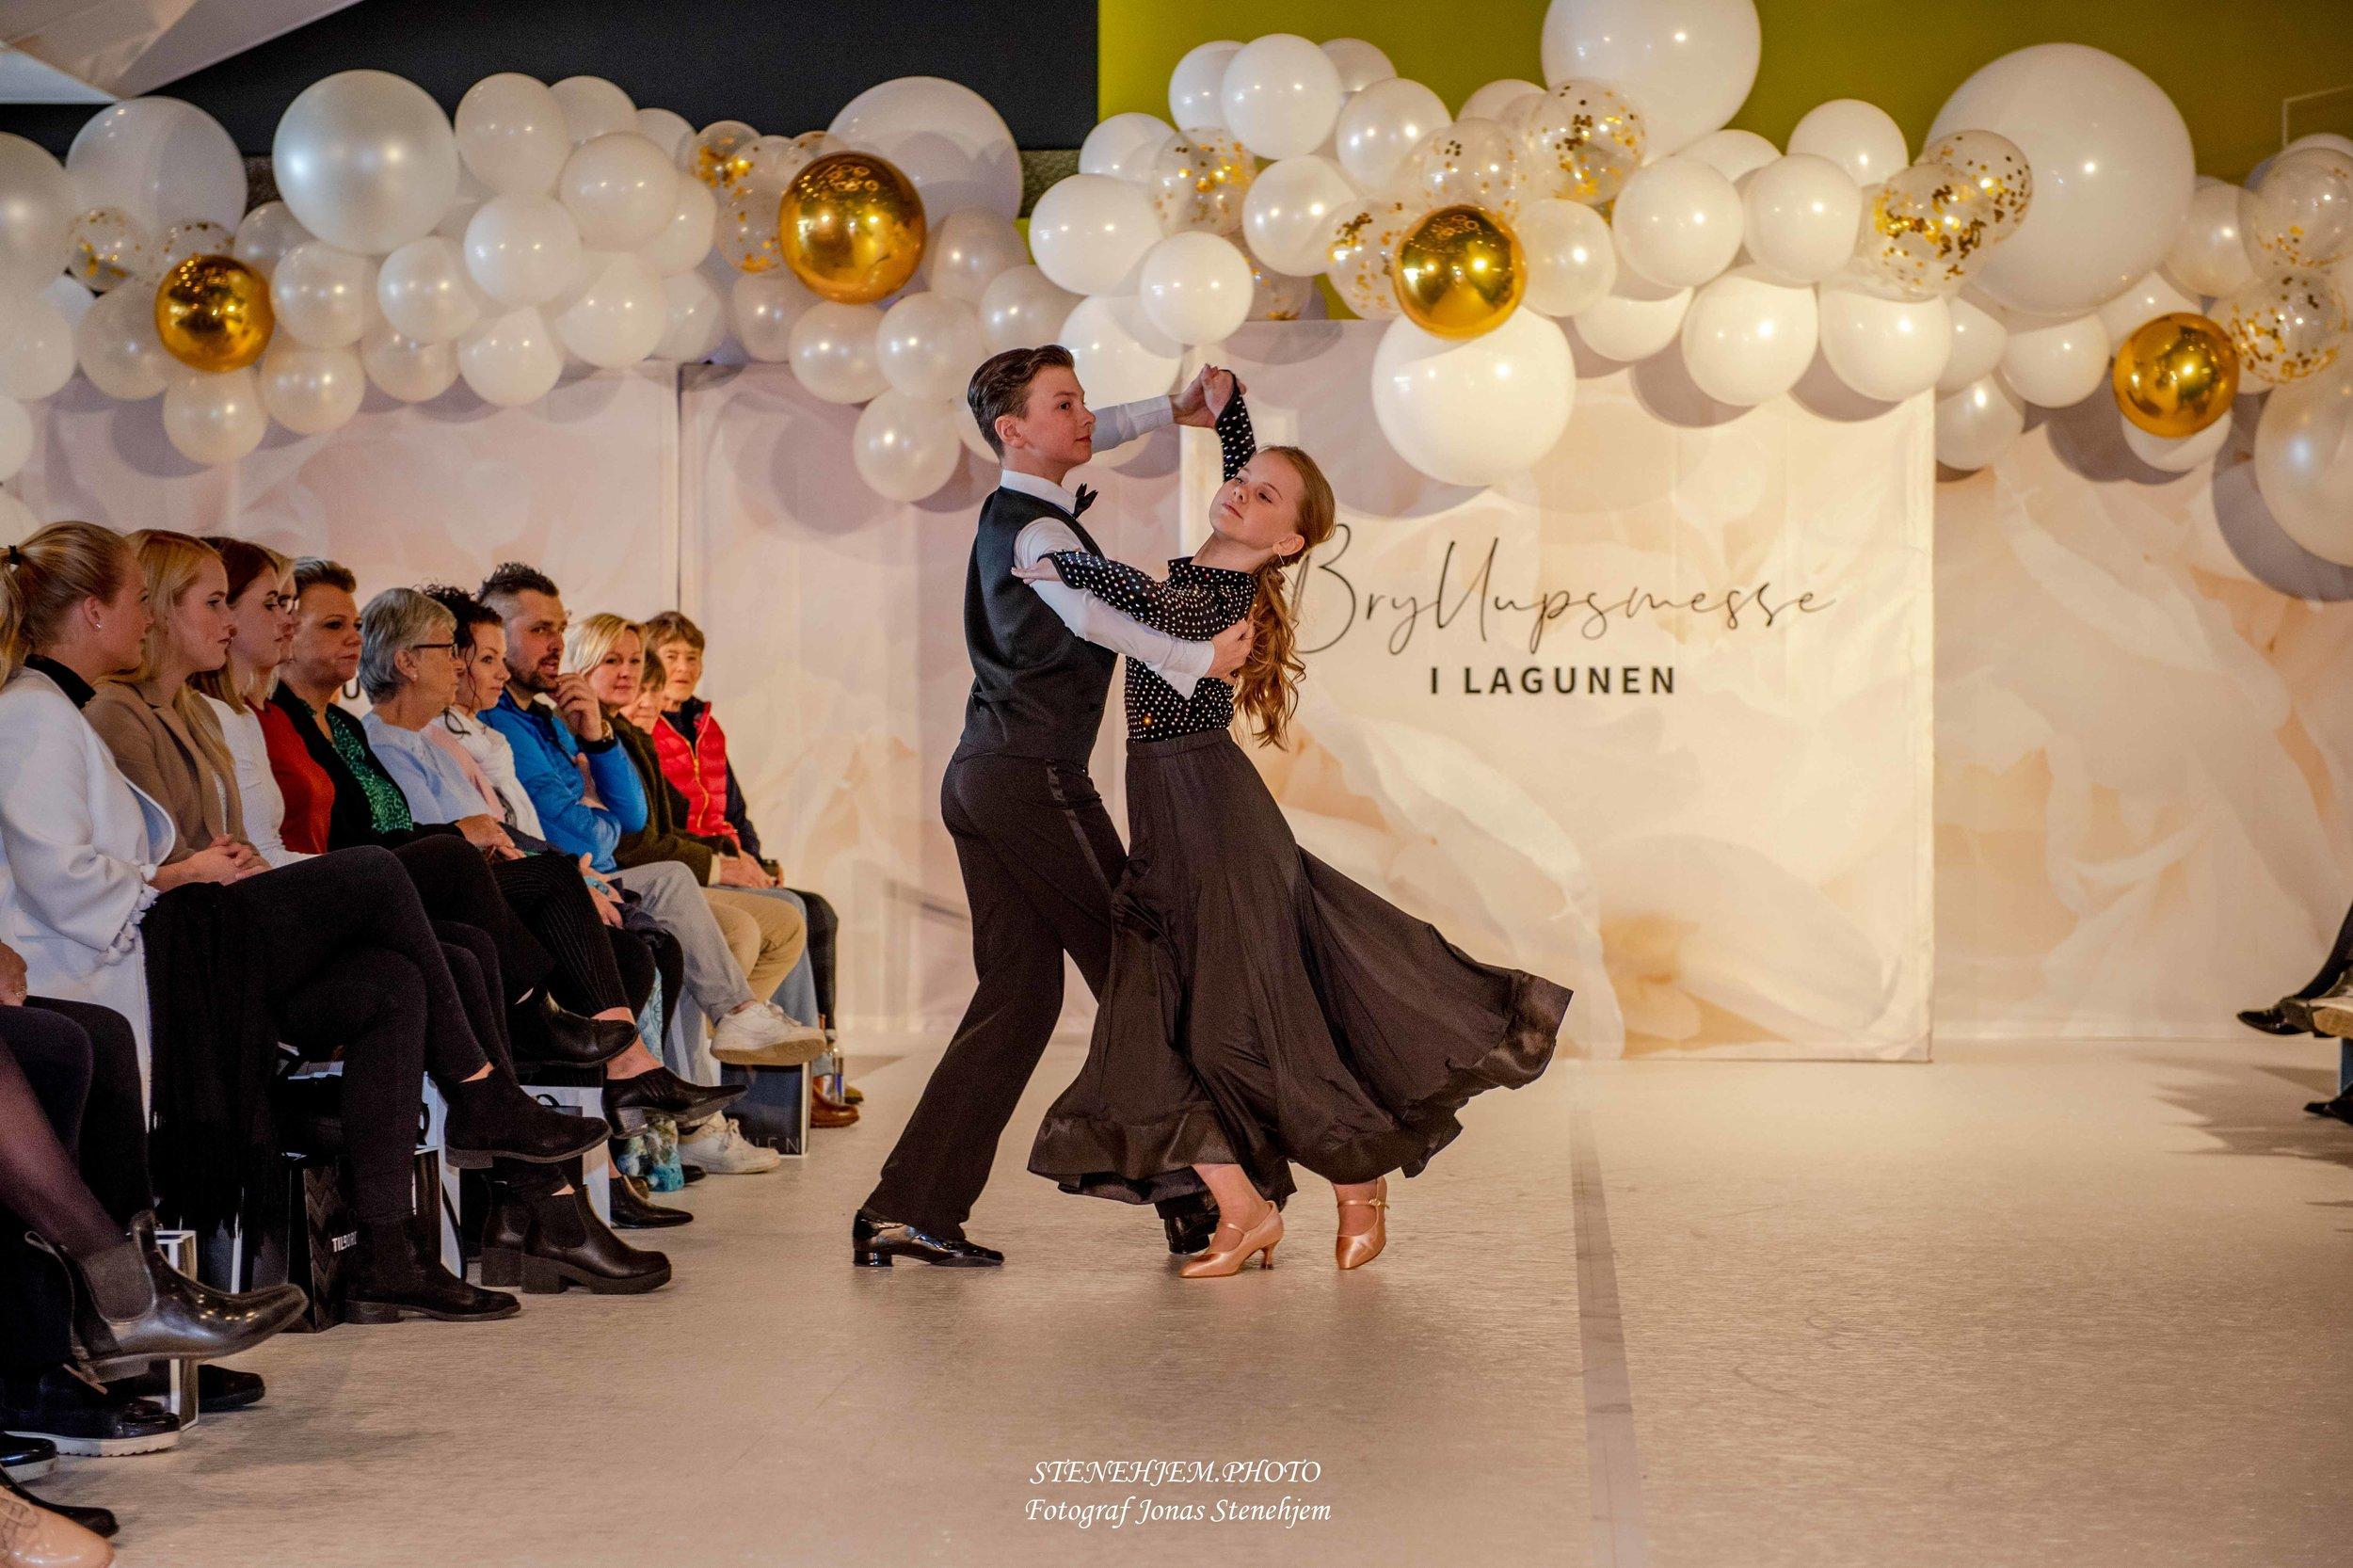 Bryllupsmesse_Lagunen_mittaltweddingfair__029.jpg